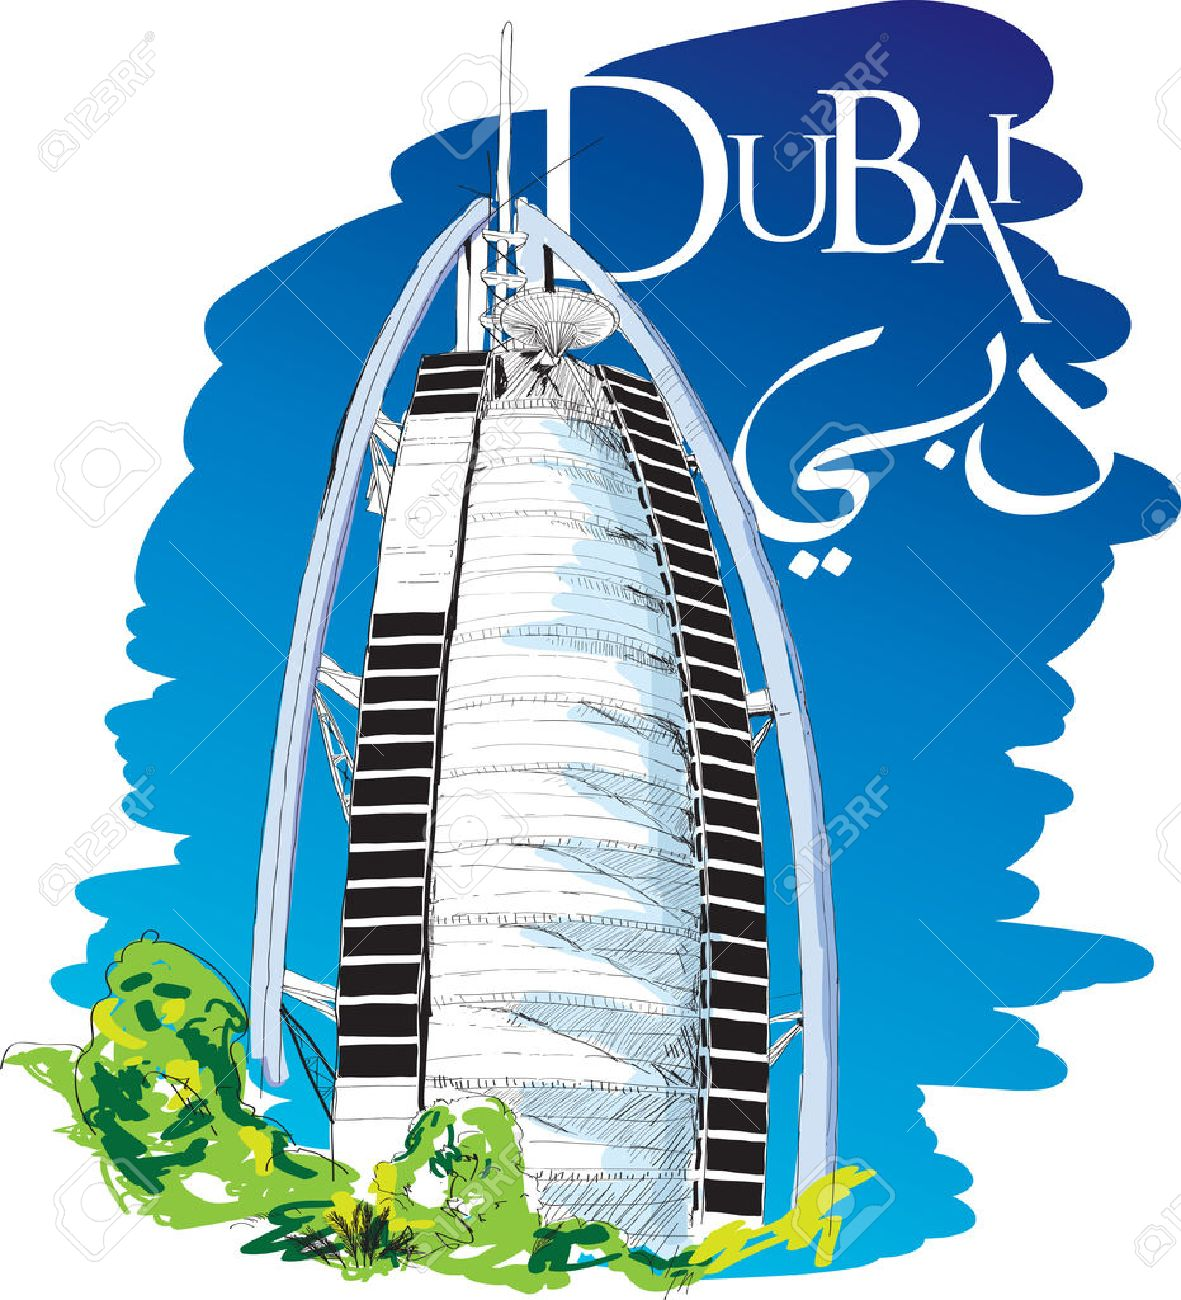 Dubai Clipart 2-dubai clipart 2-10